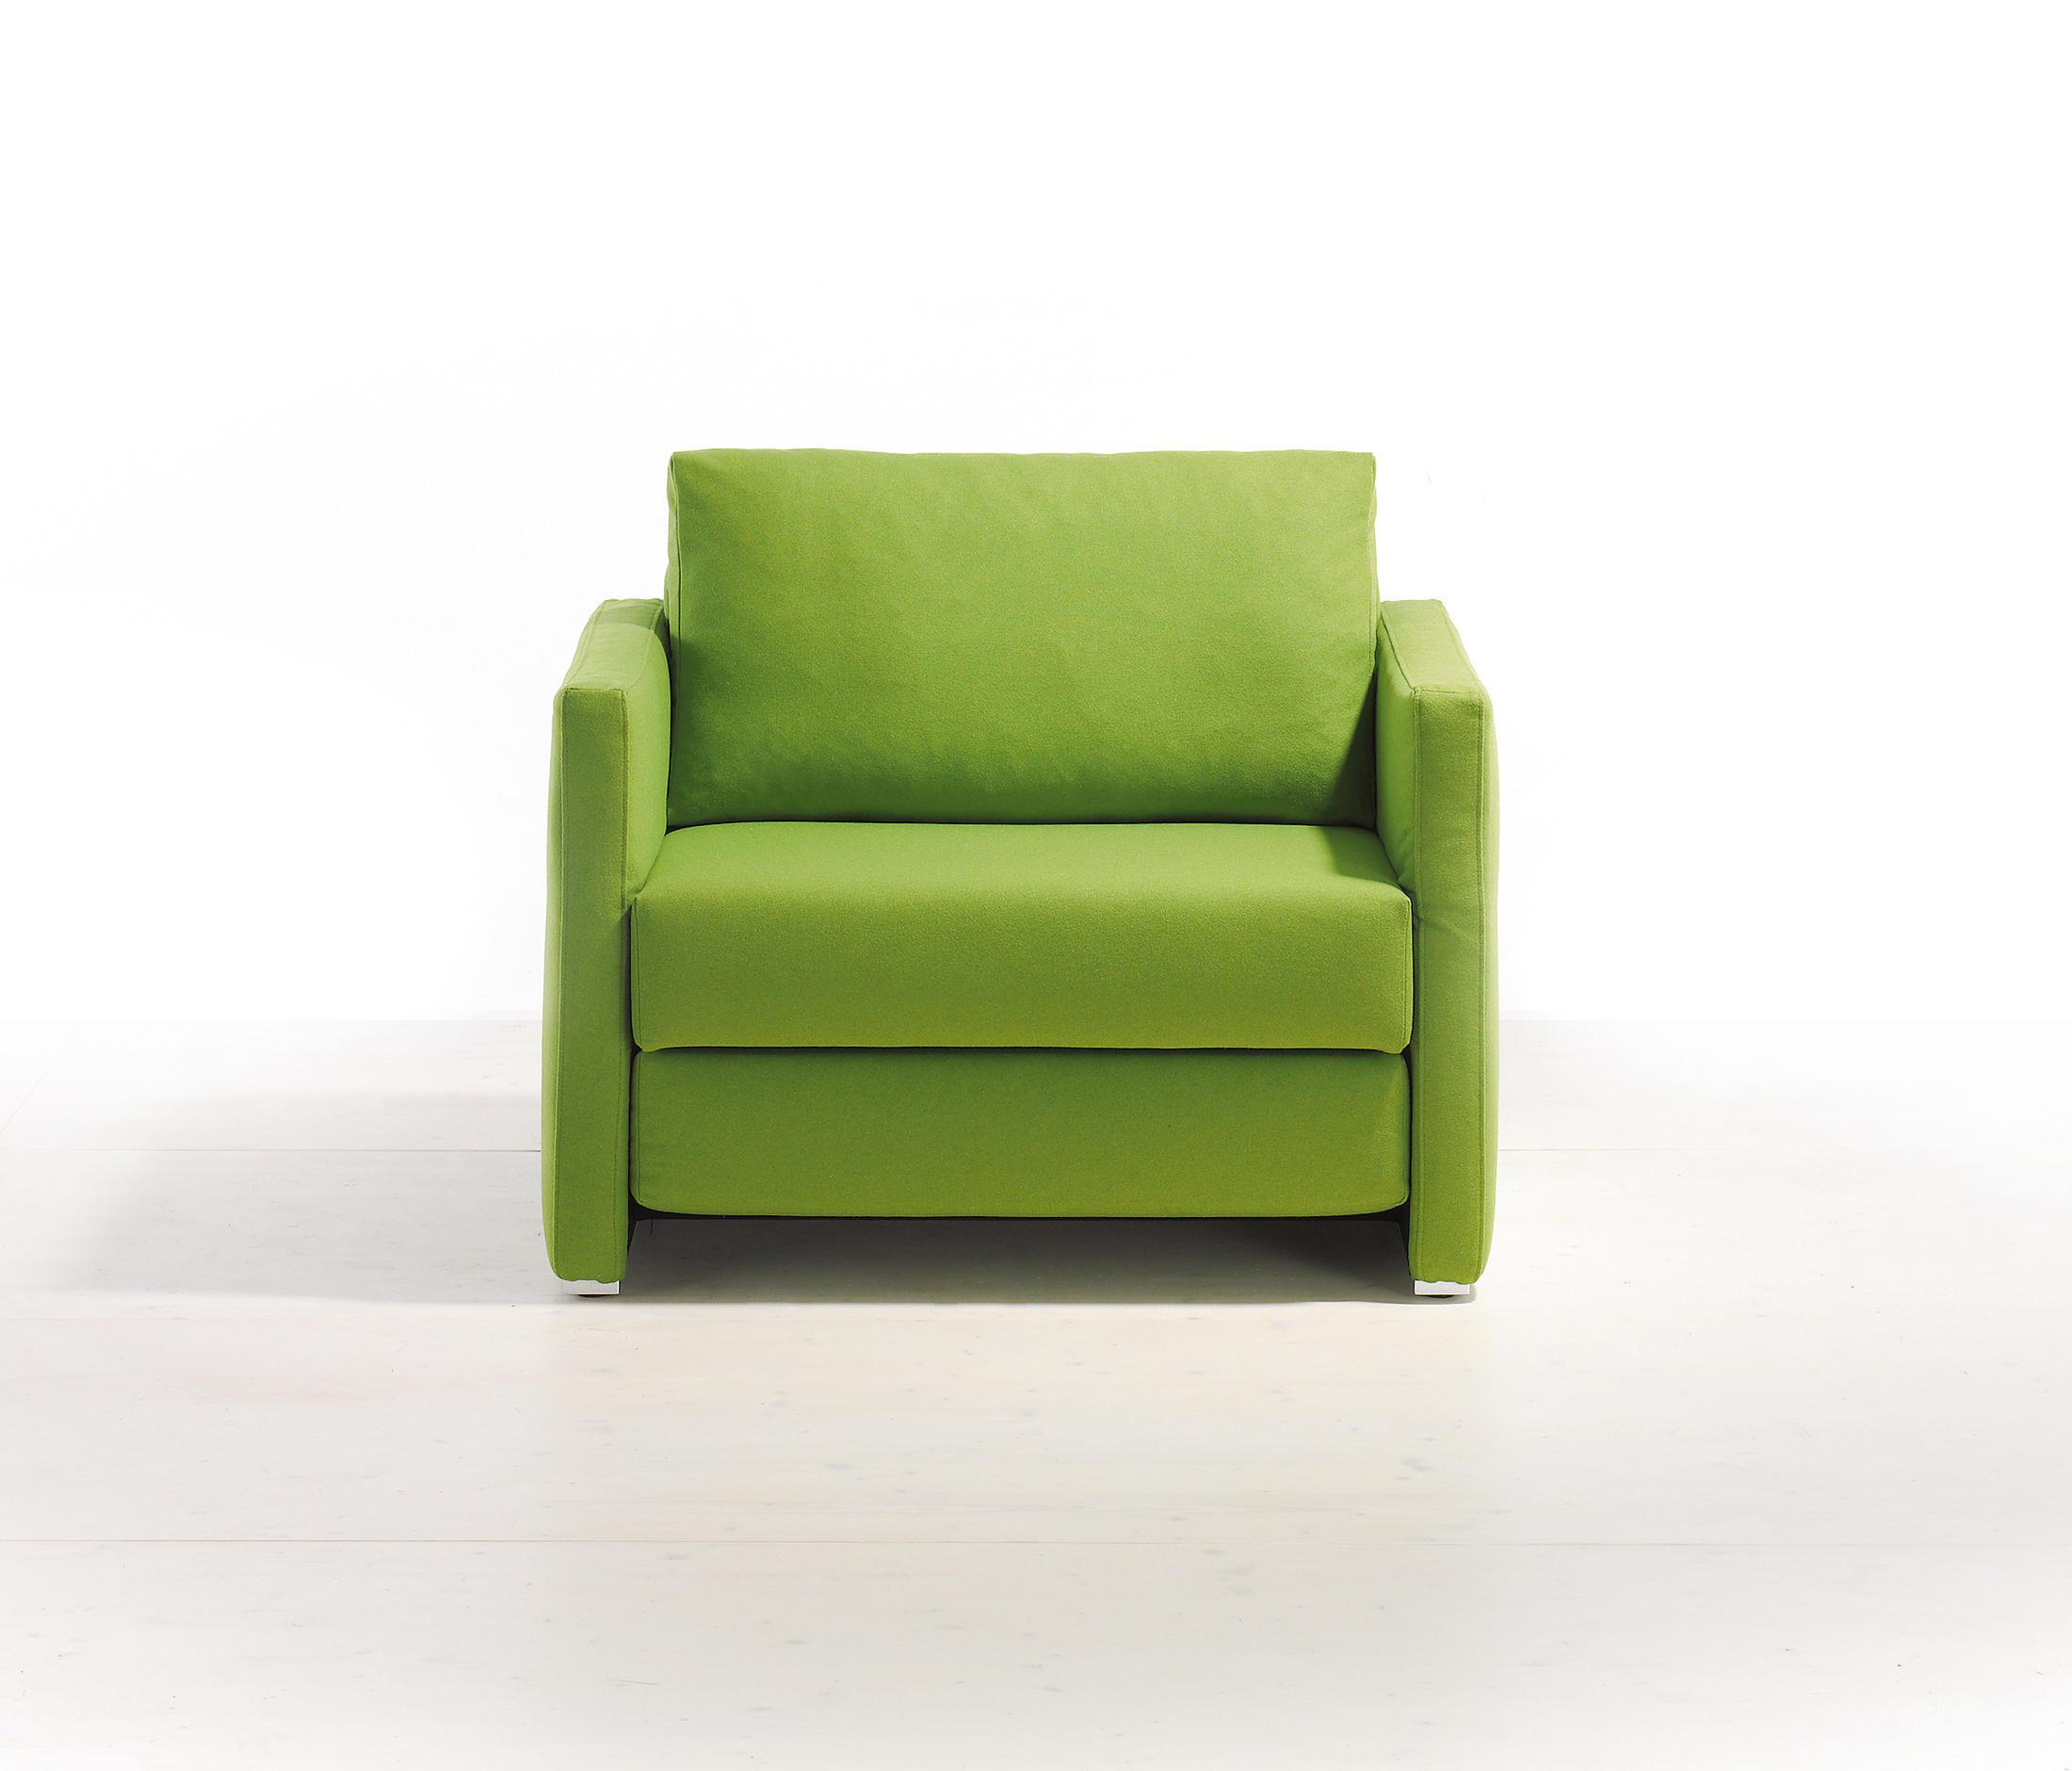 sofa mart idaho falls table desk ecksofa leder braun cheap eckcouch